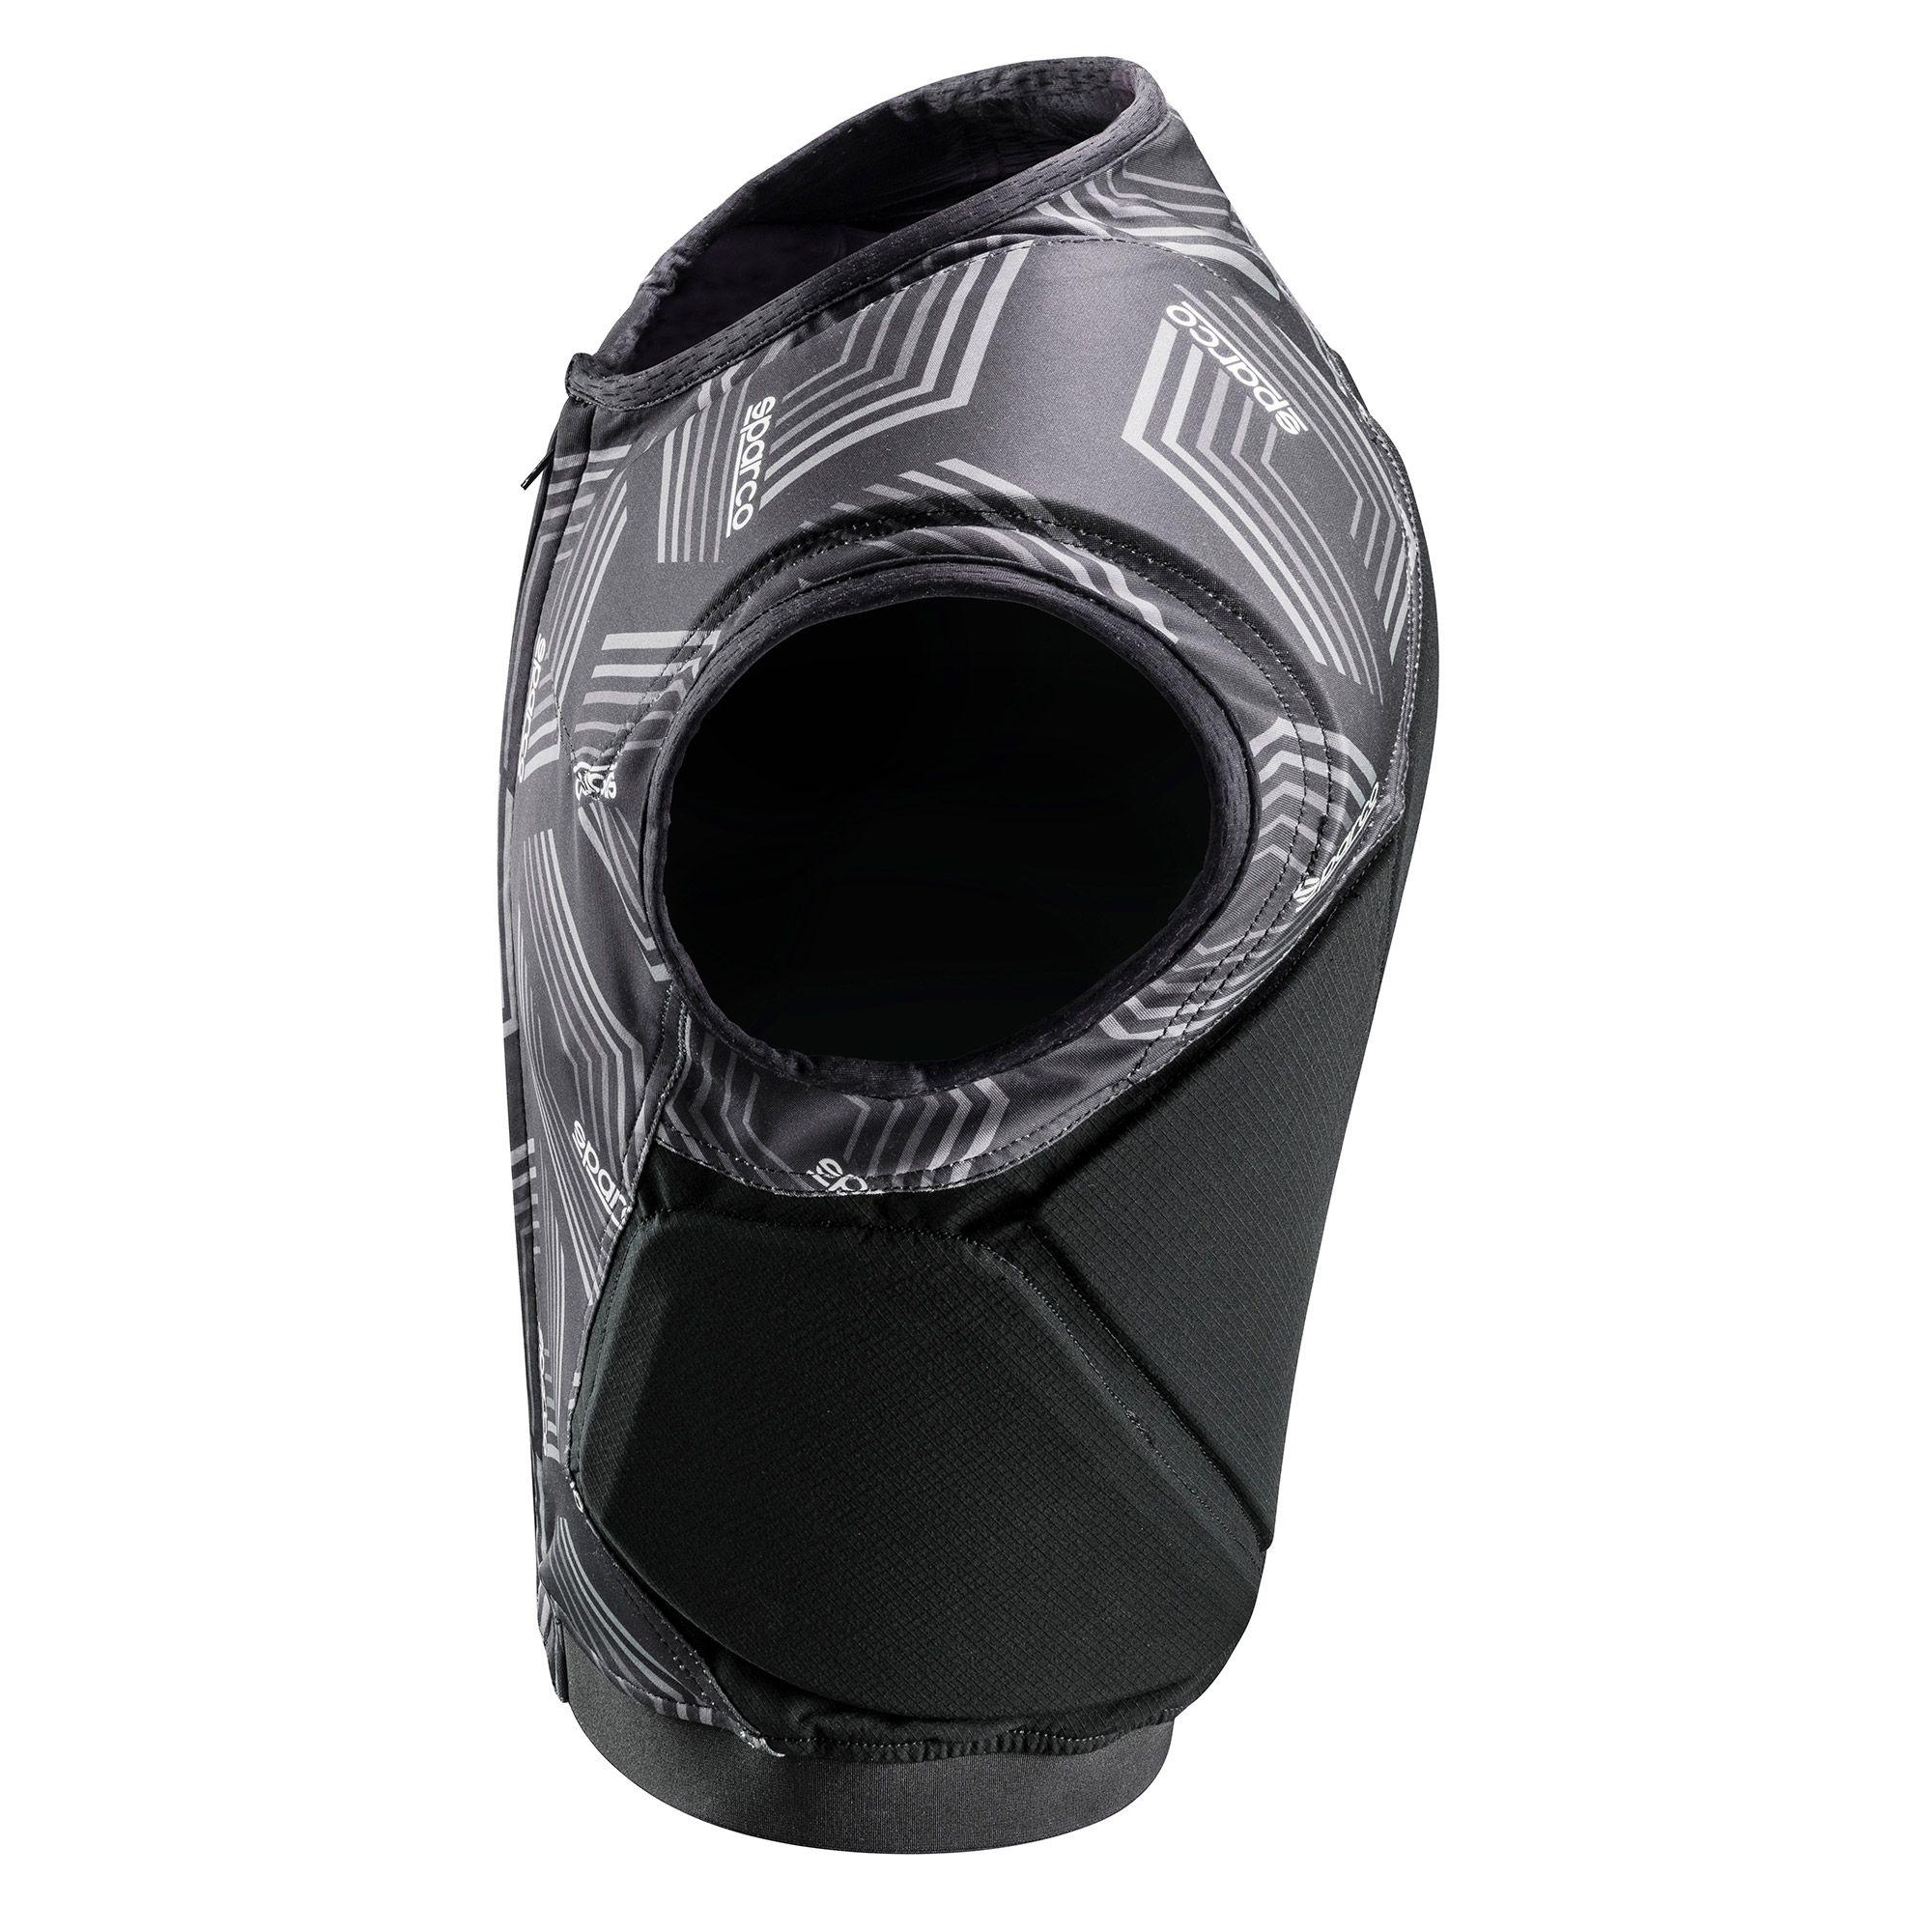 002402K-Sparco-SJ-PRO-K3-Karting-Kart-Protection-Vest-Jacket-Rib-Protector thumbnail 11